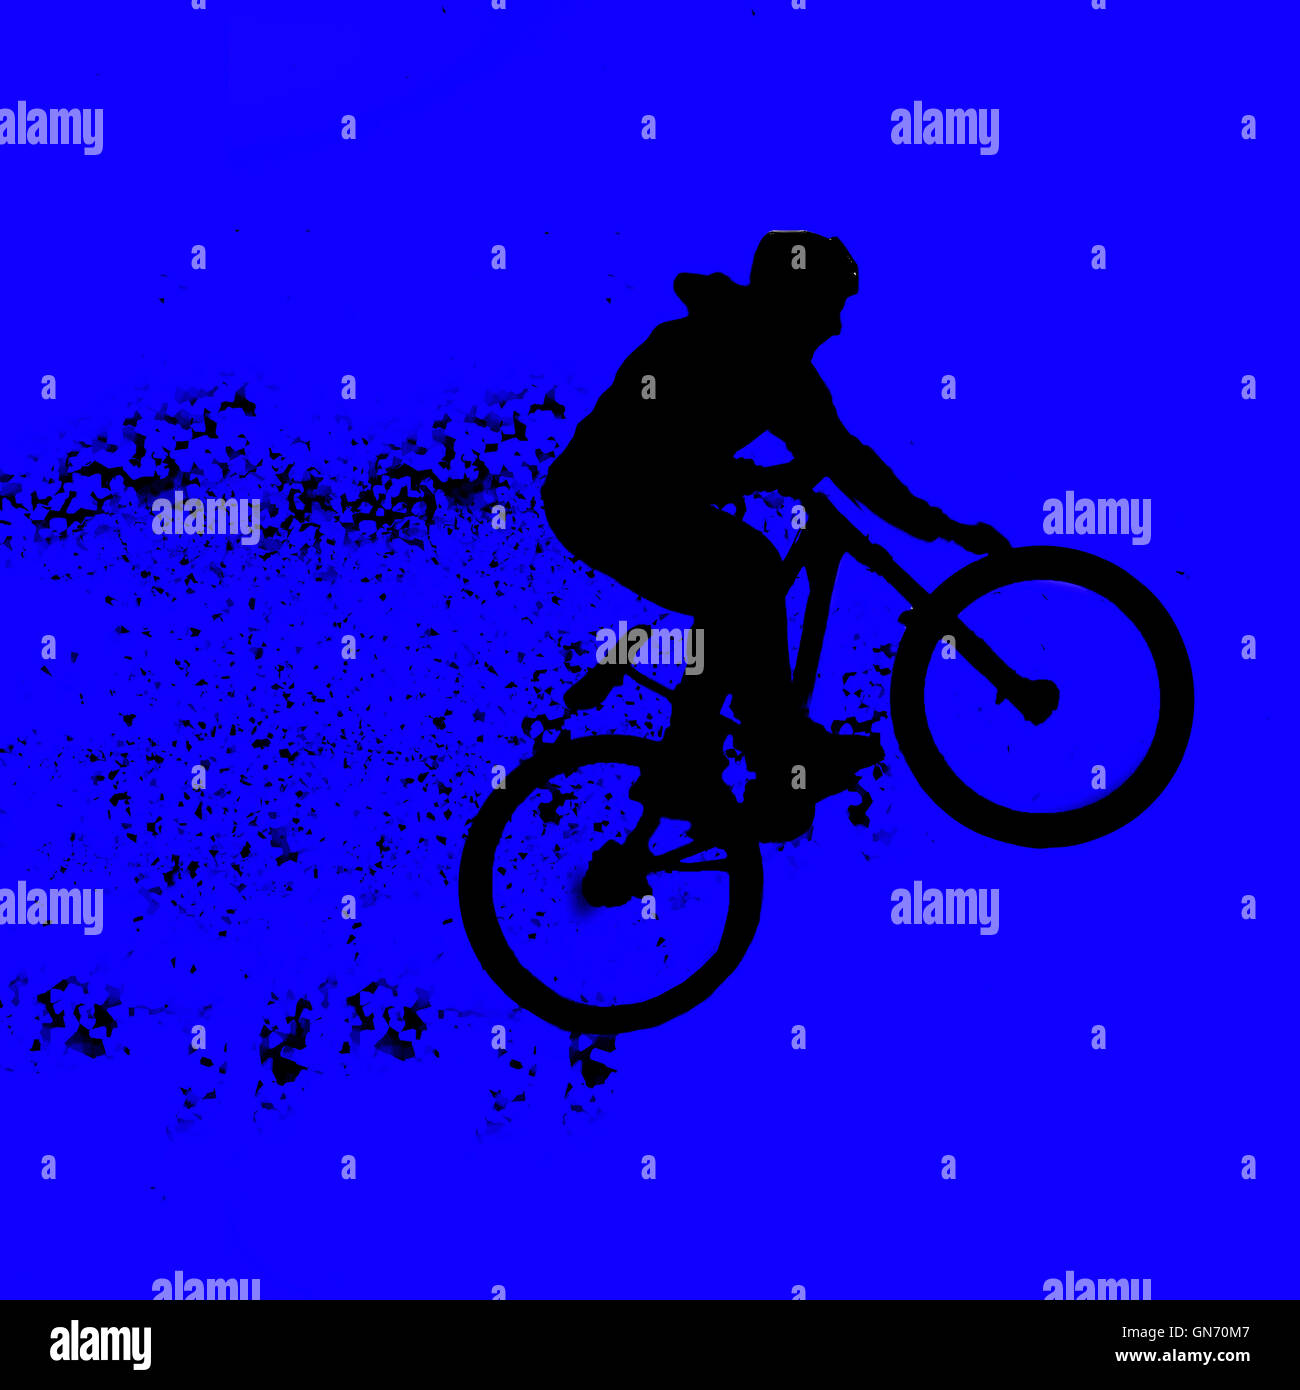 Digitally enhanced image of a bicycle stunt - Stock Image